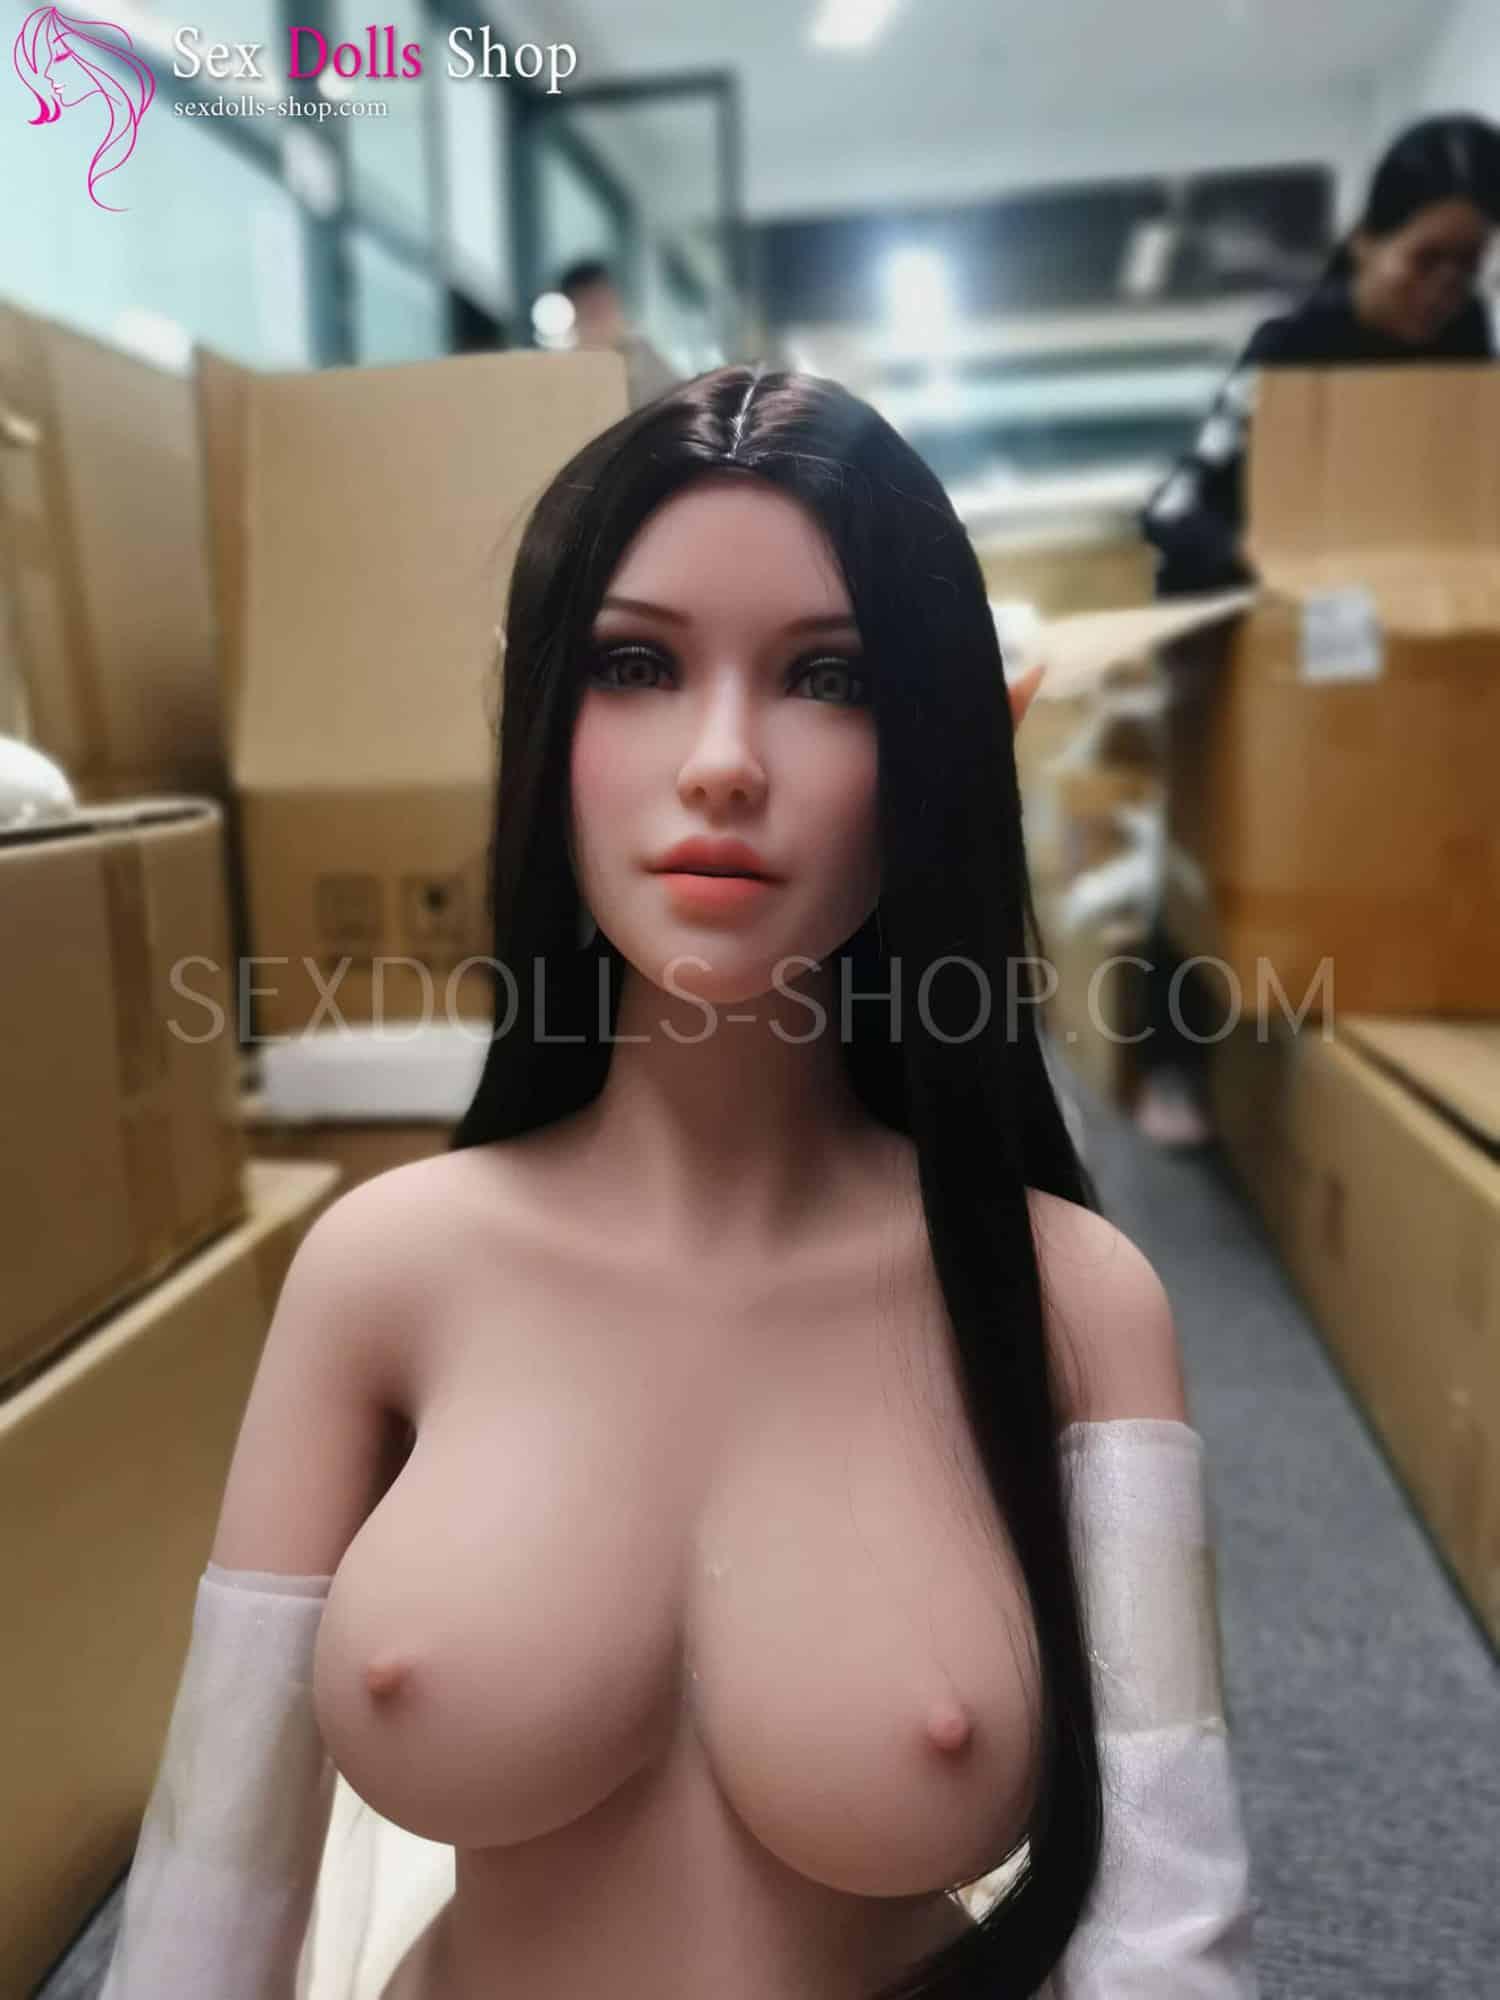 sedoll 168cm F cup medium skin skin nipples head 21